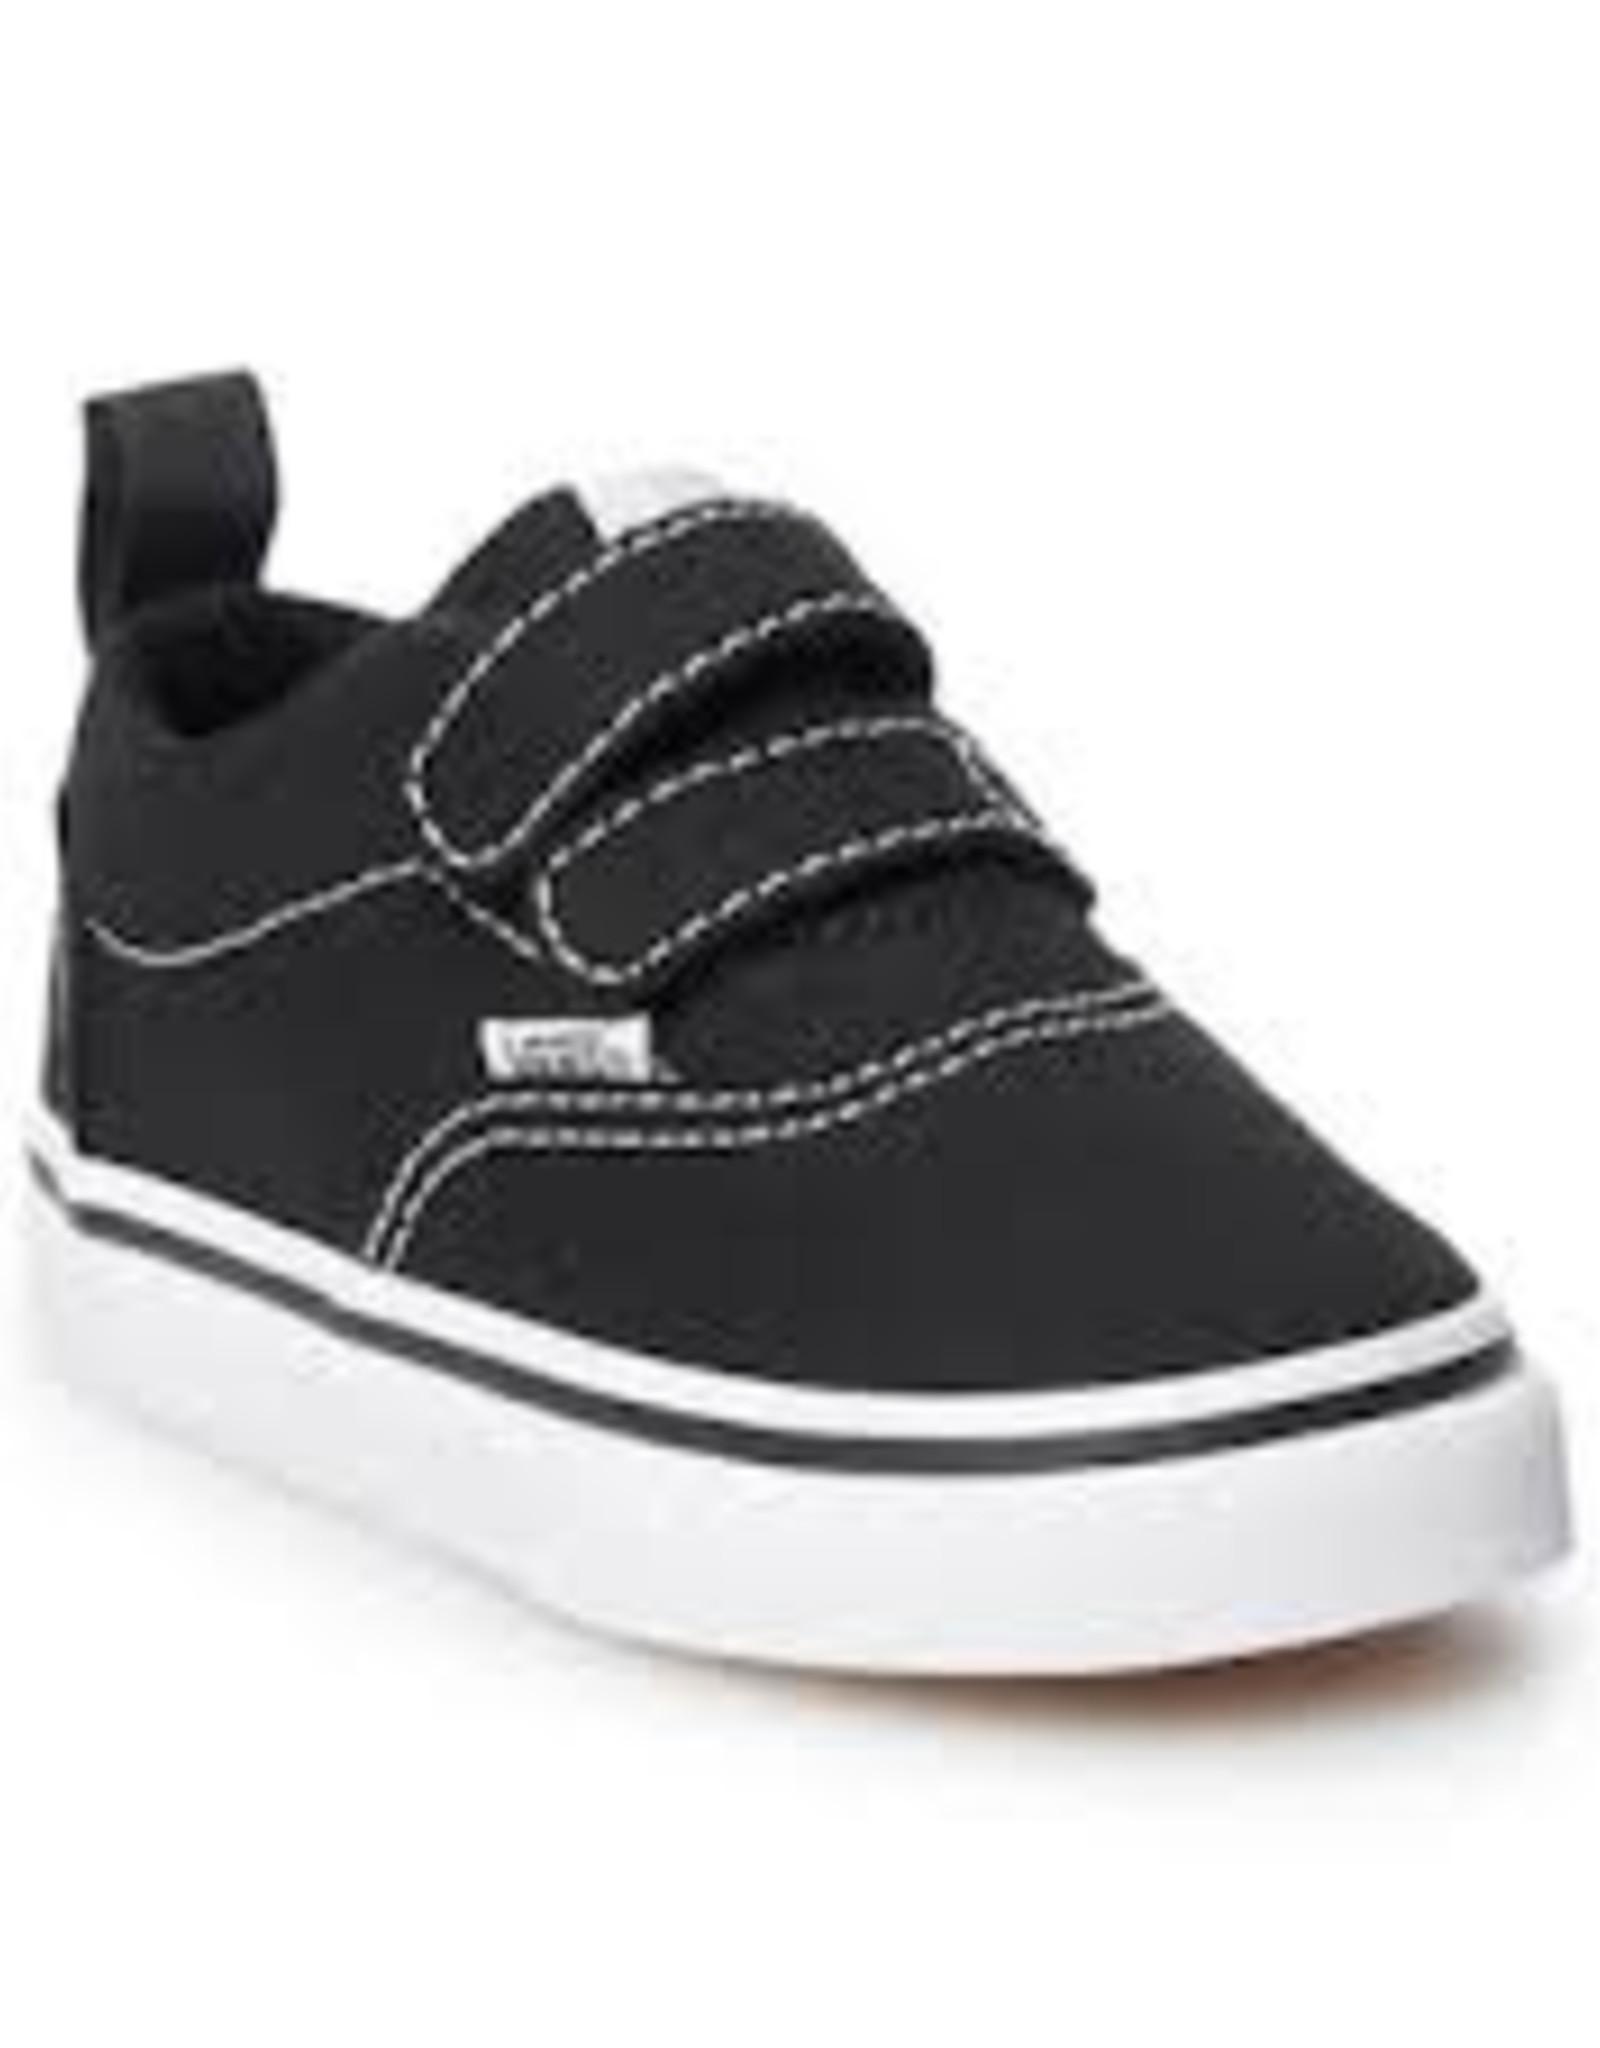 Vans Toddler Doheny V Canvas - Black